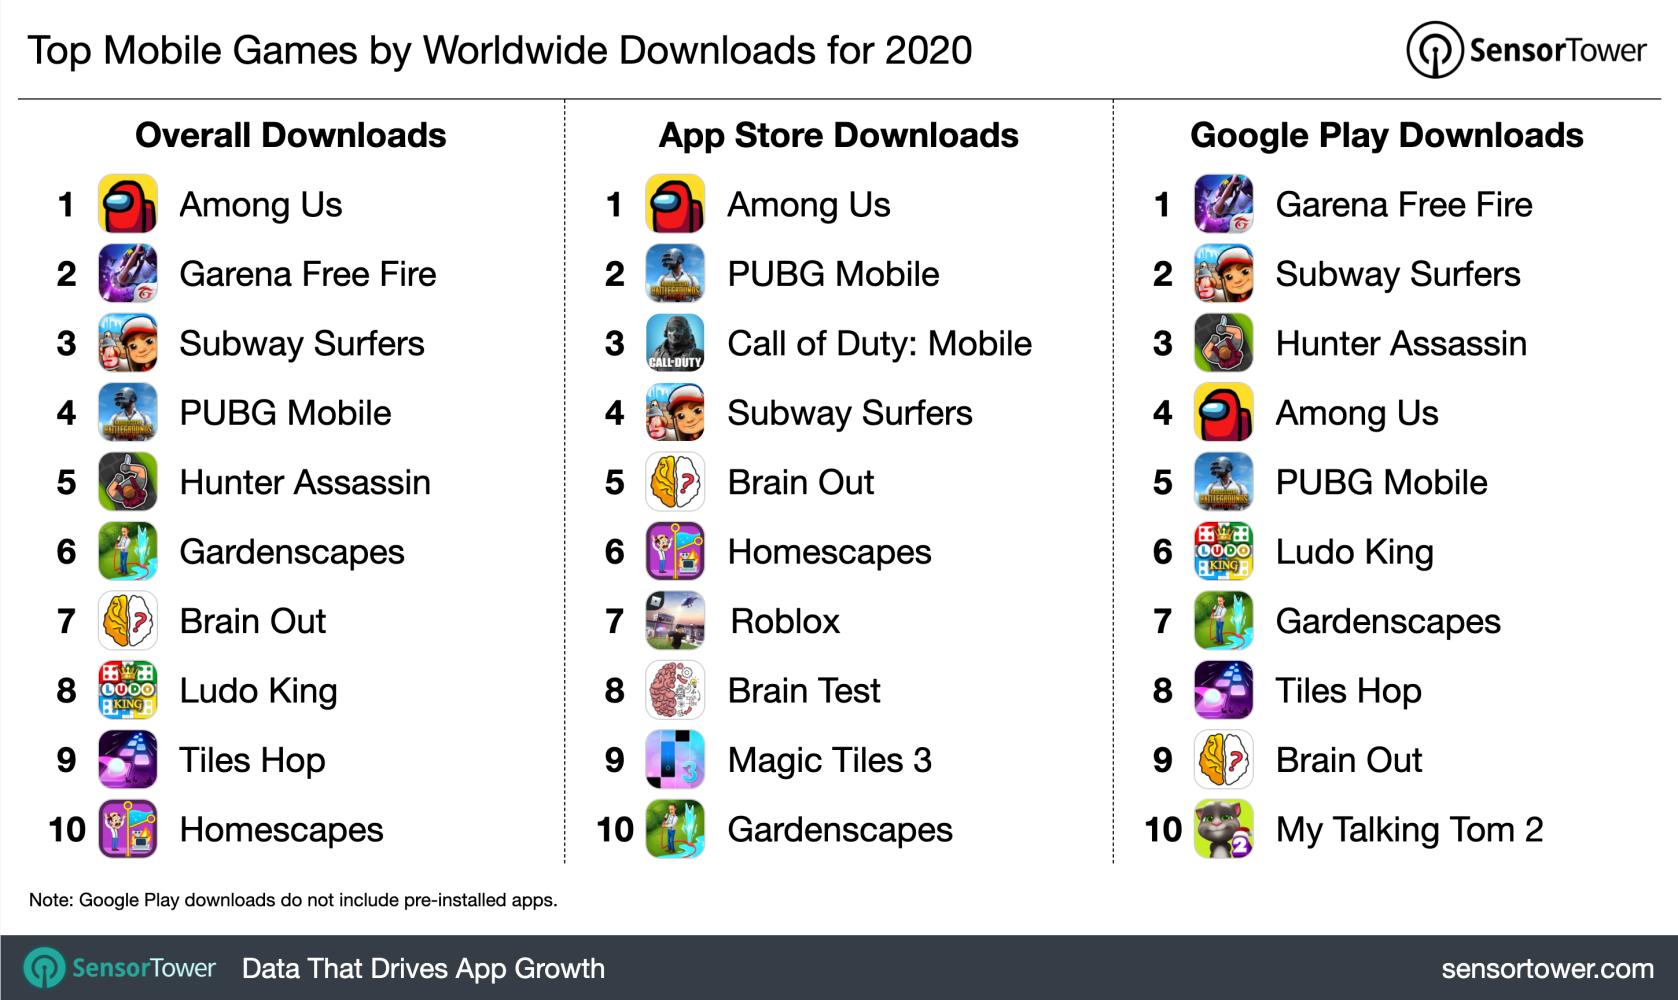 App Store vs Google Play